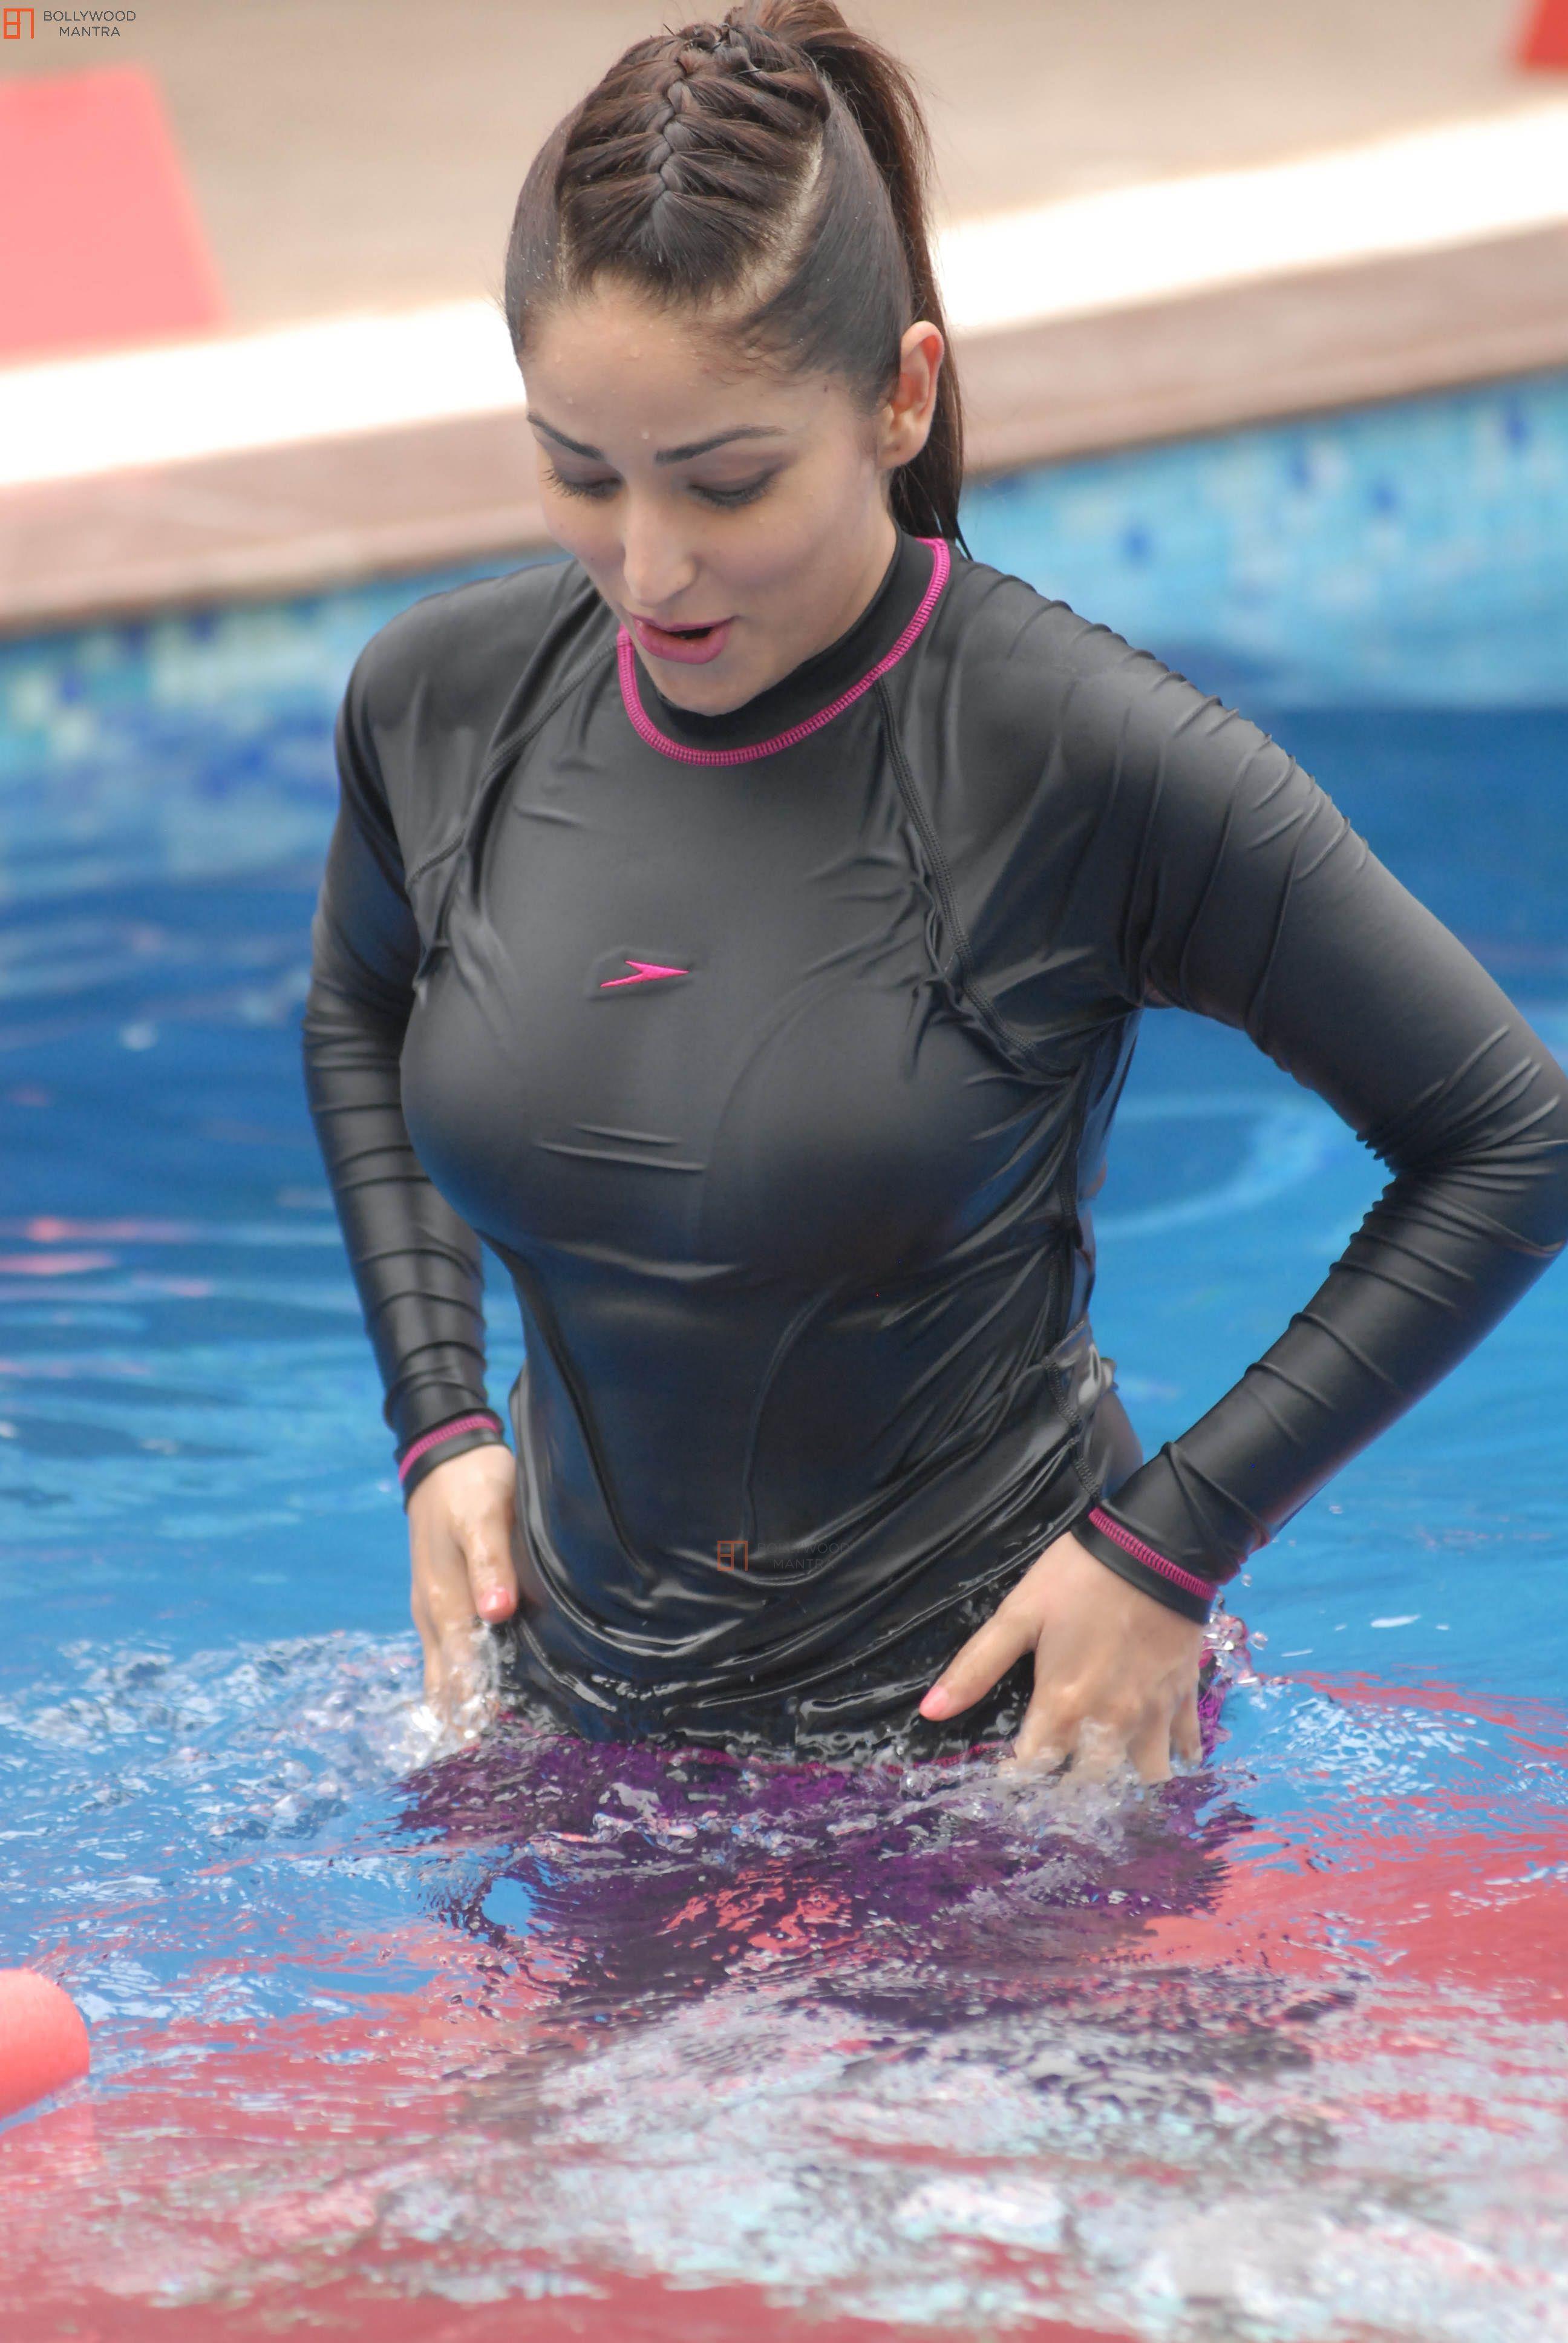 the sensual celeb : Selena Gomez Hot Wet Photos